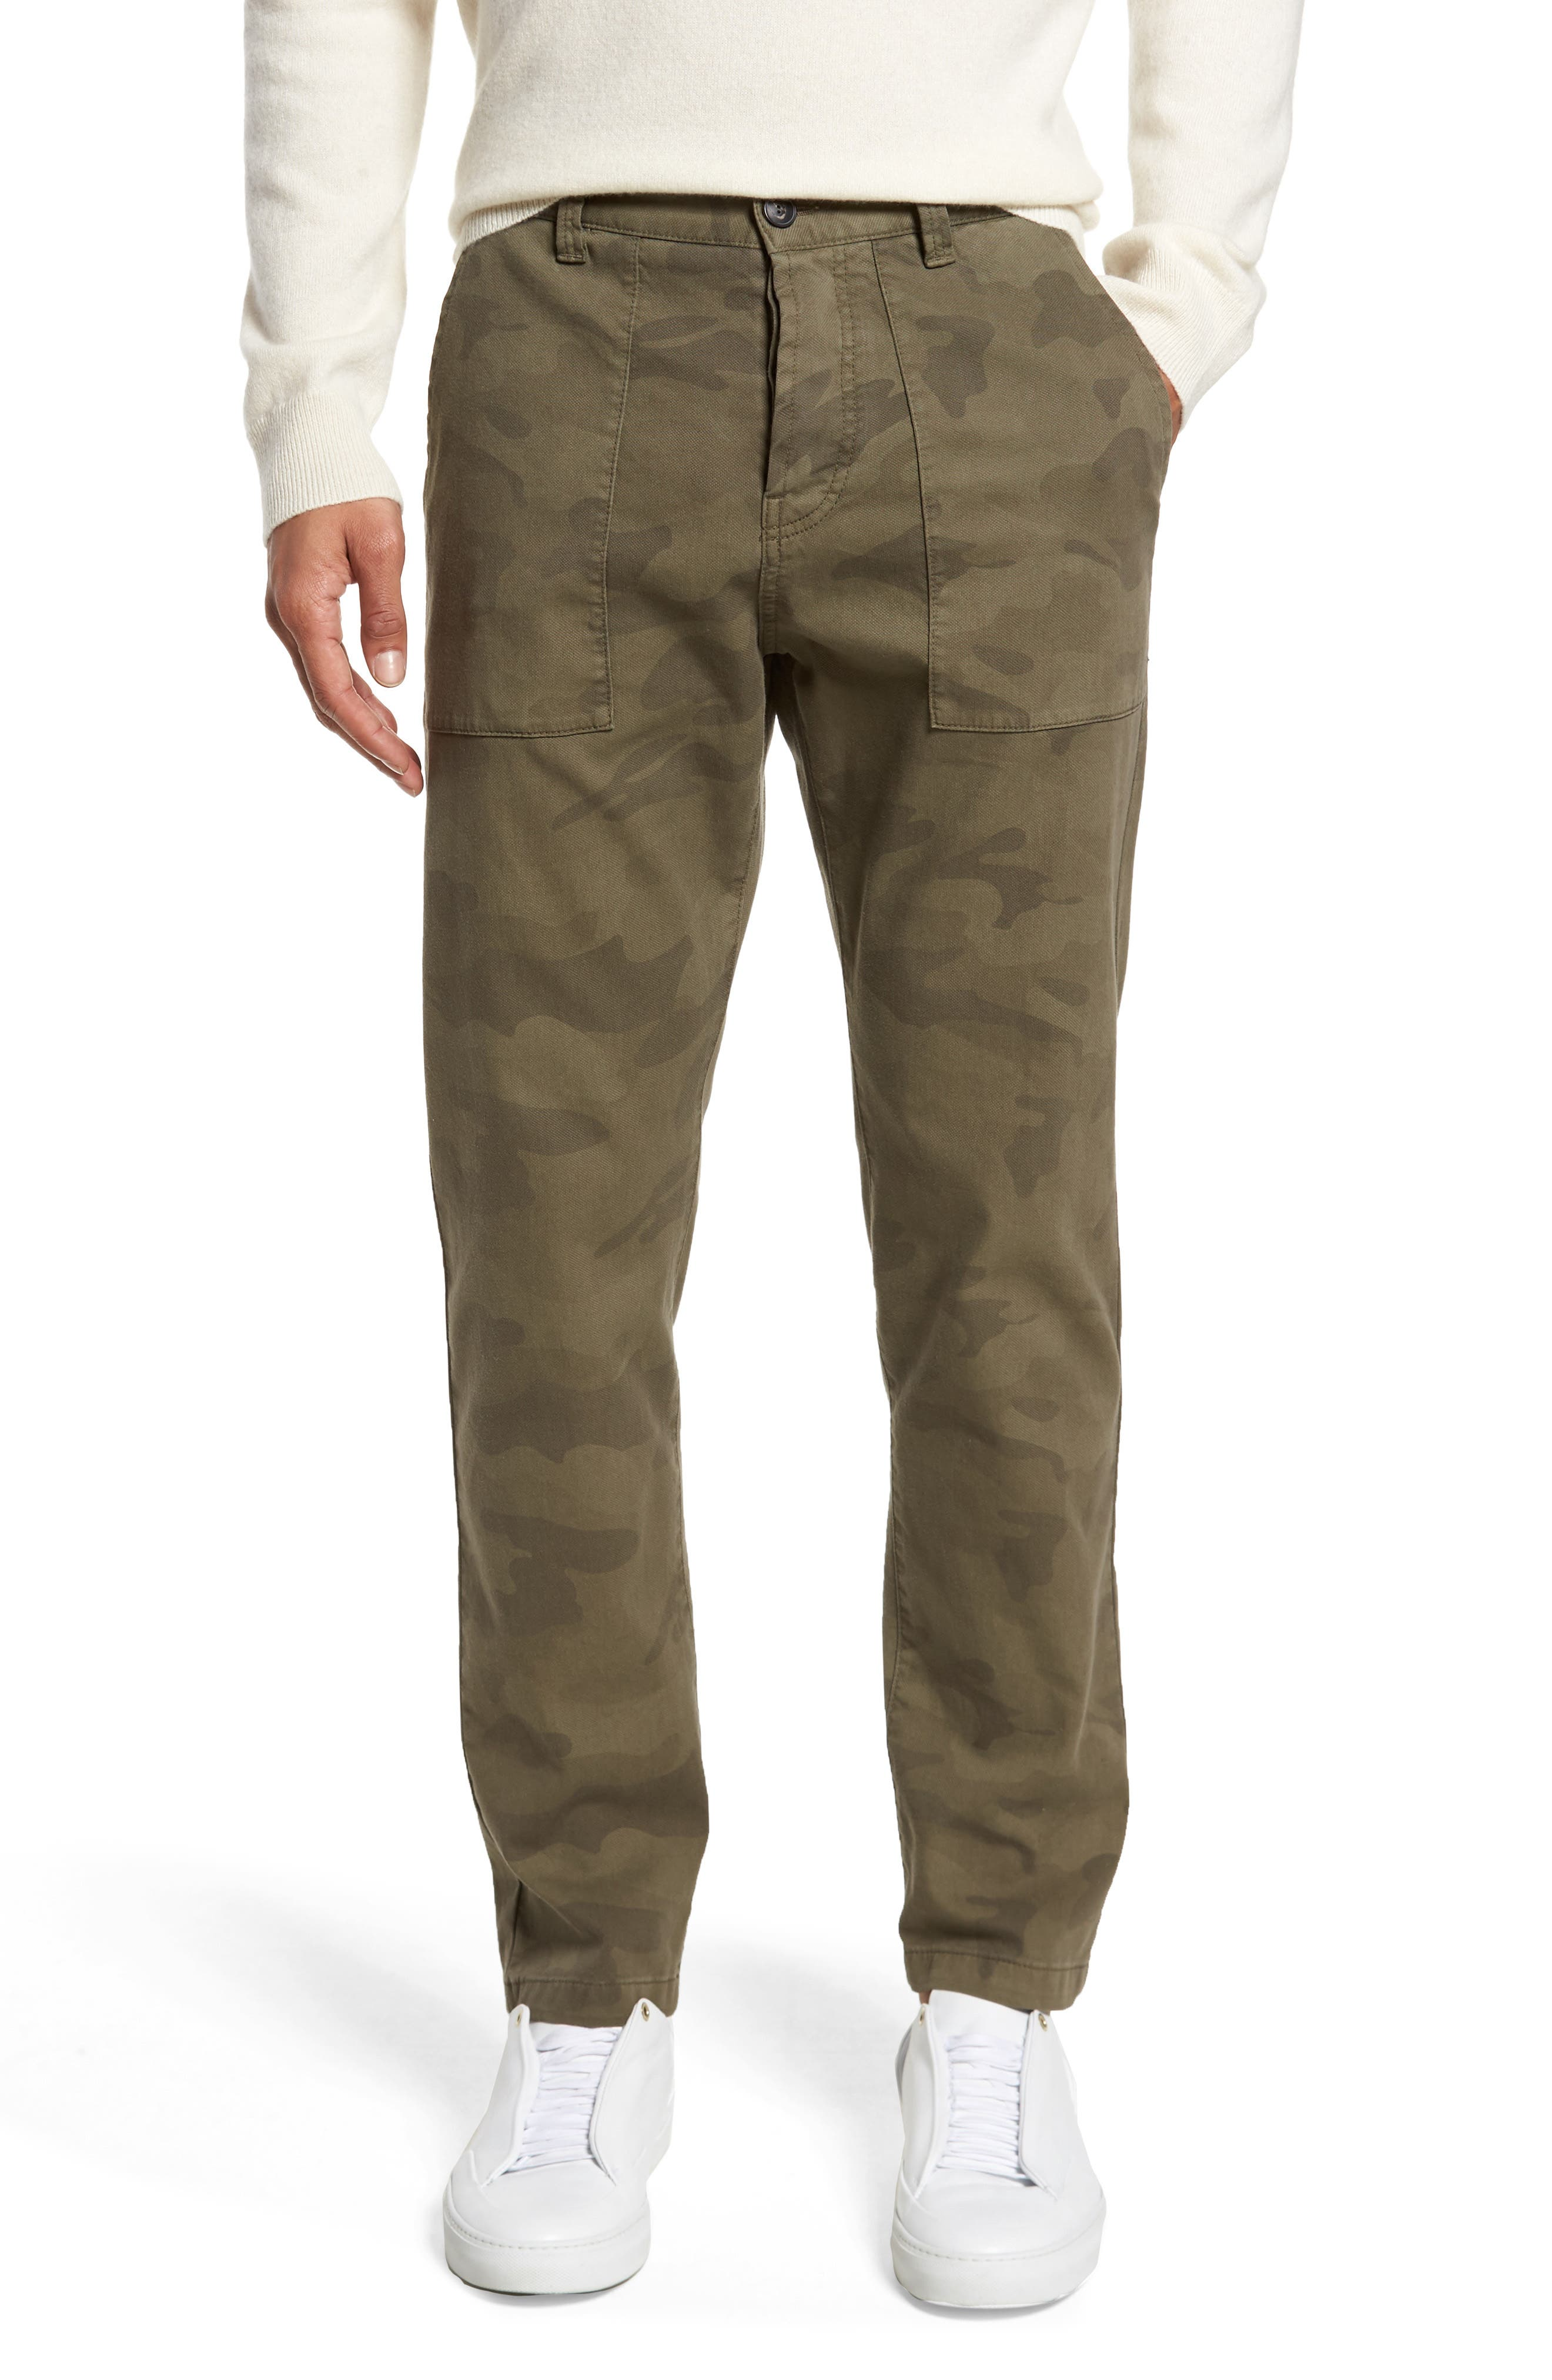 Alternate Image 1 Selected - Eleventy Camo Fatigue Pocket Pants